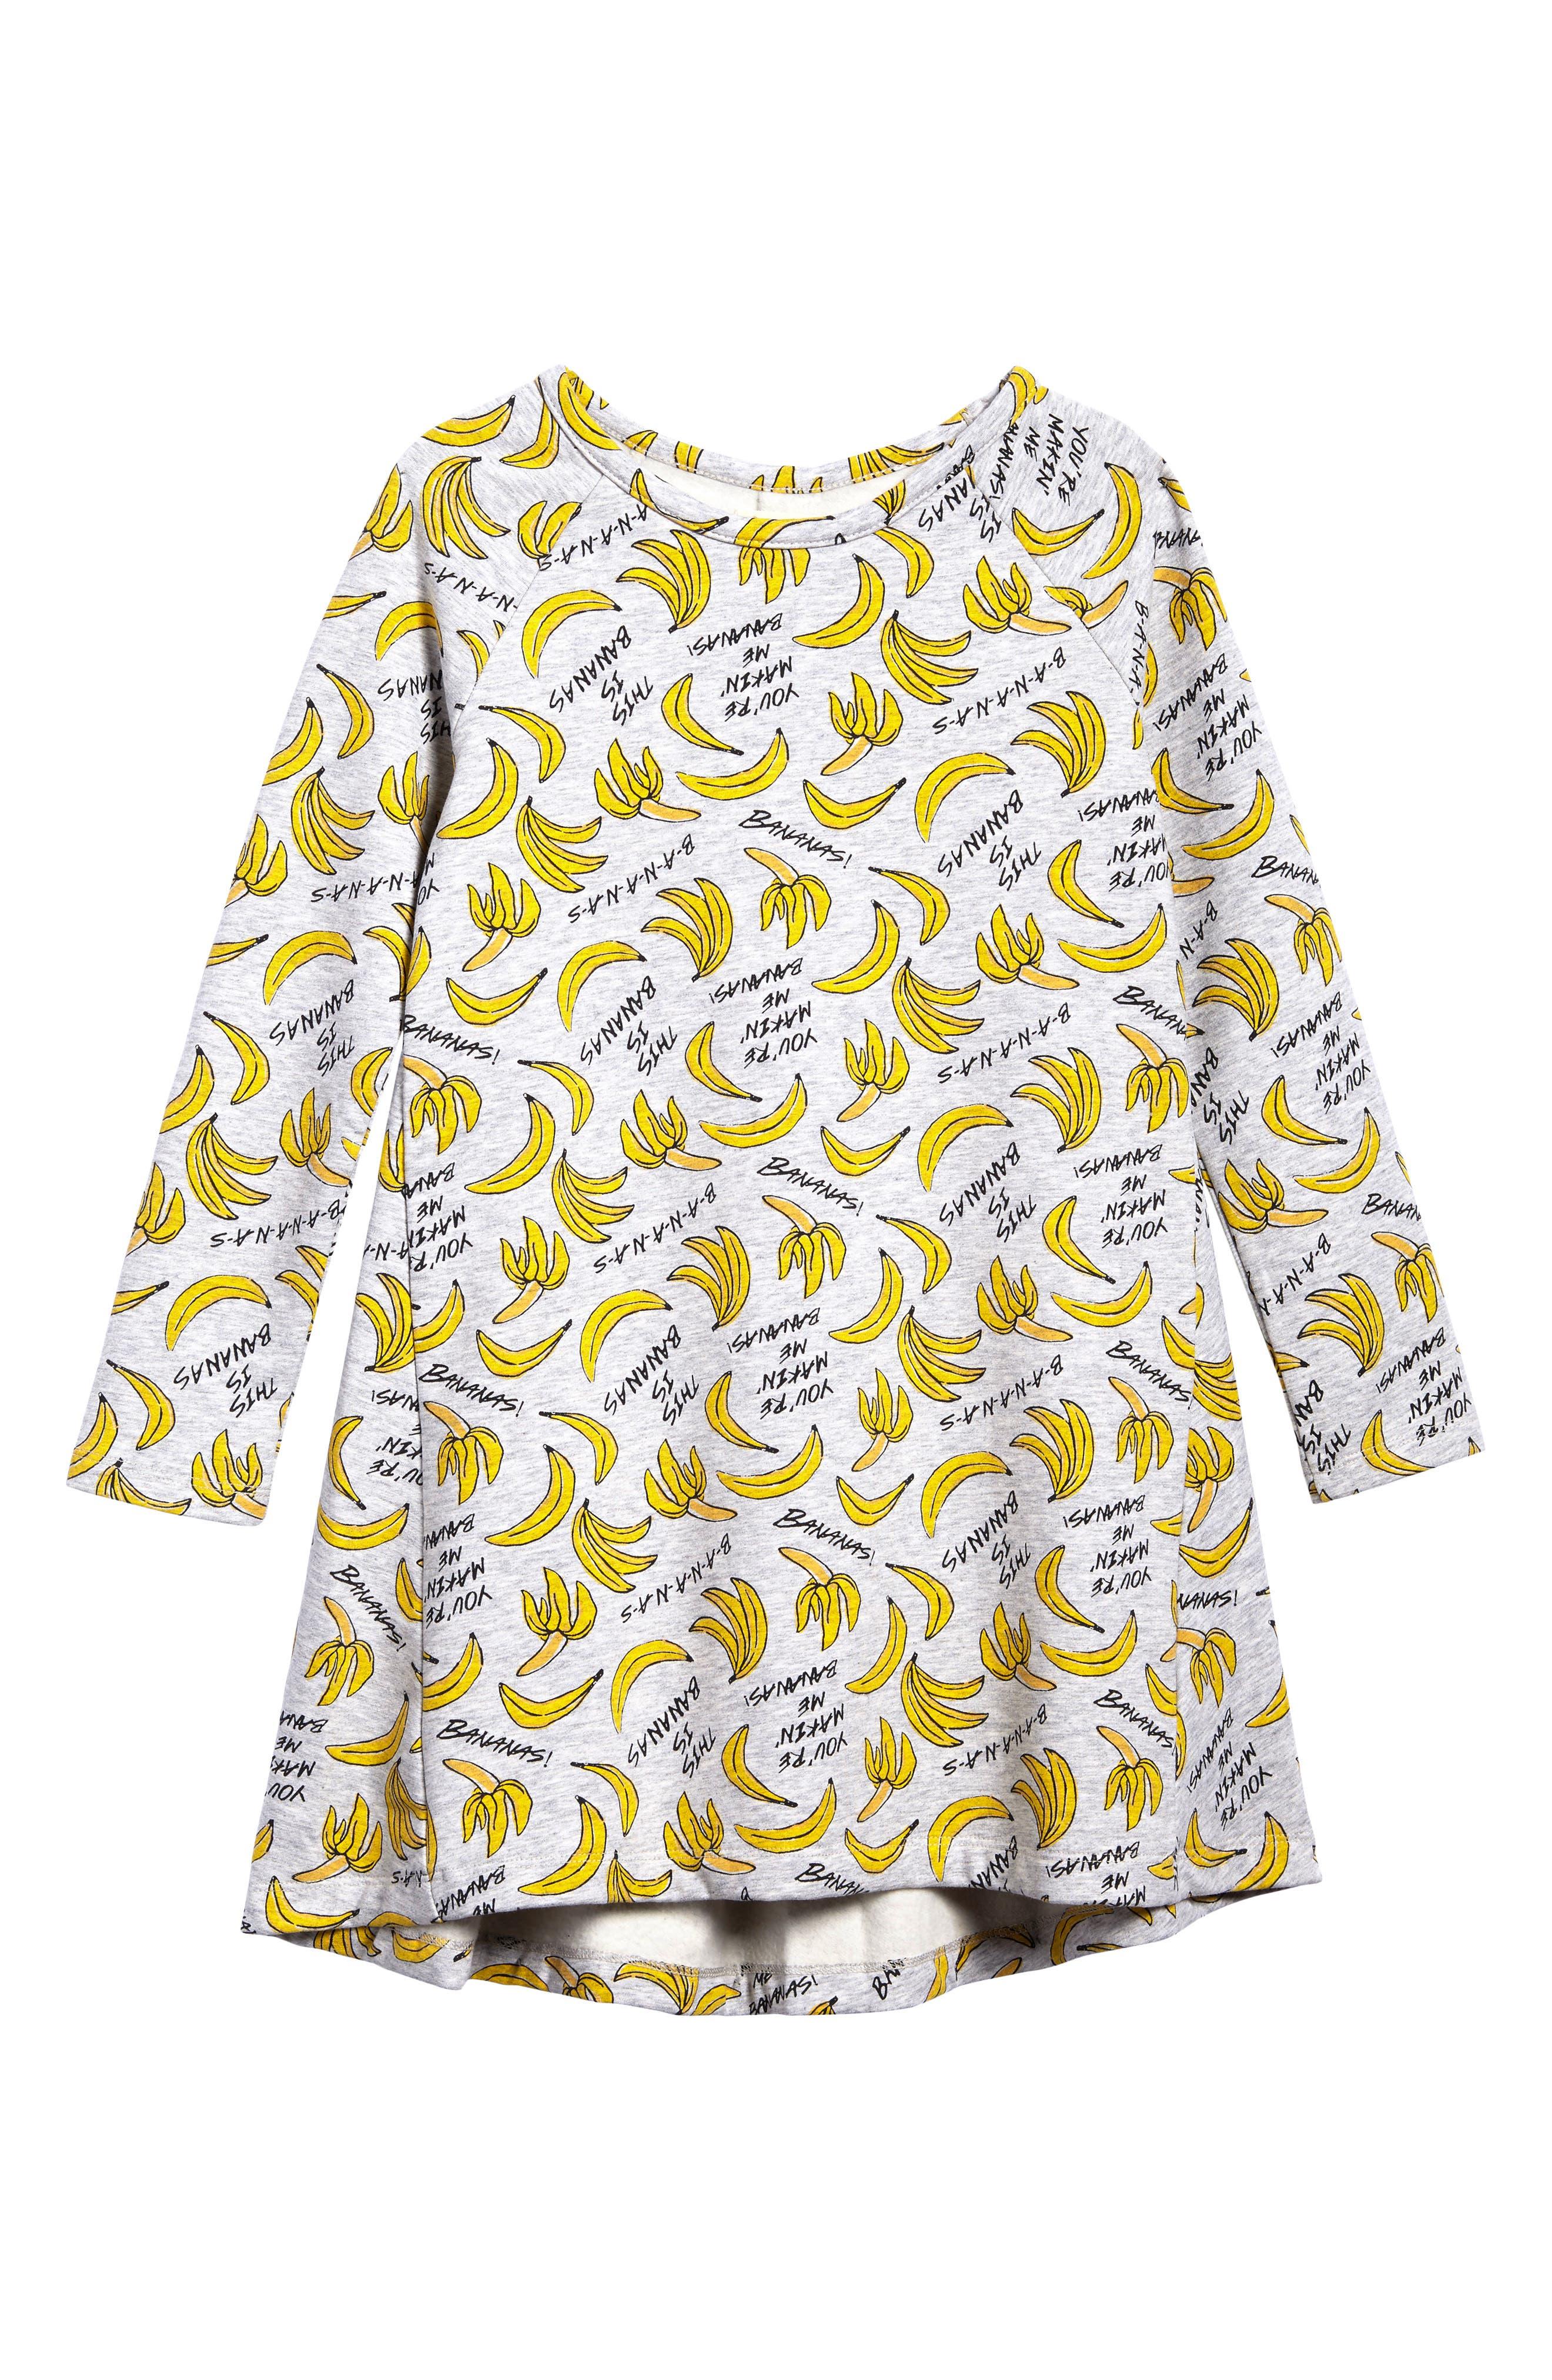 Alternate Image 1 Selected - Tucker + Tate  Print Fleece Dress (Toddler Girls, Little Girls & Big Girls)